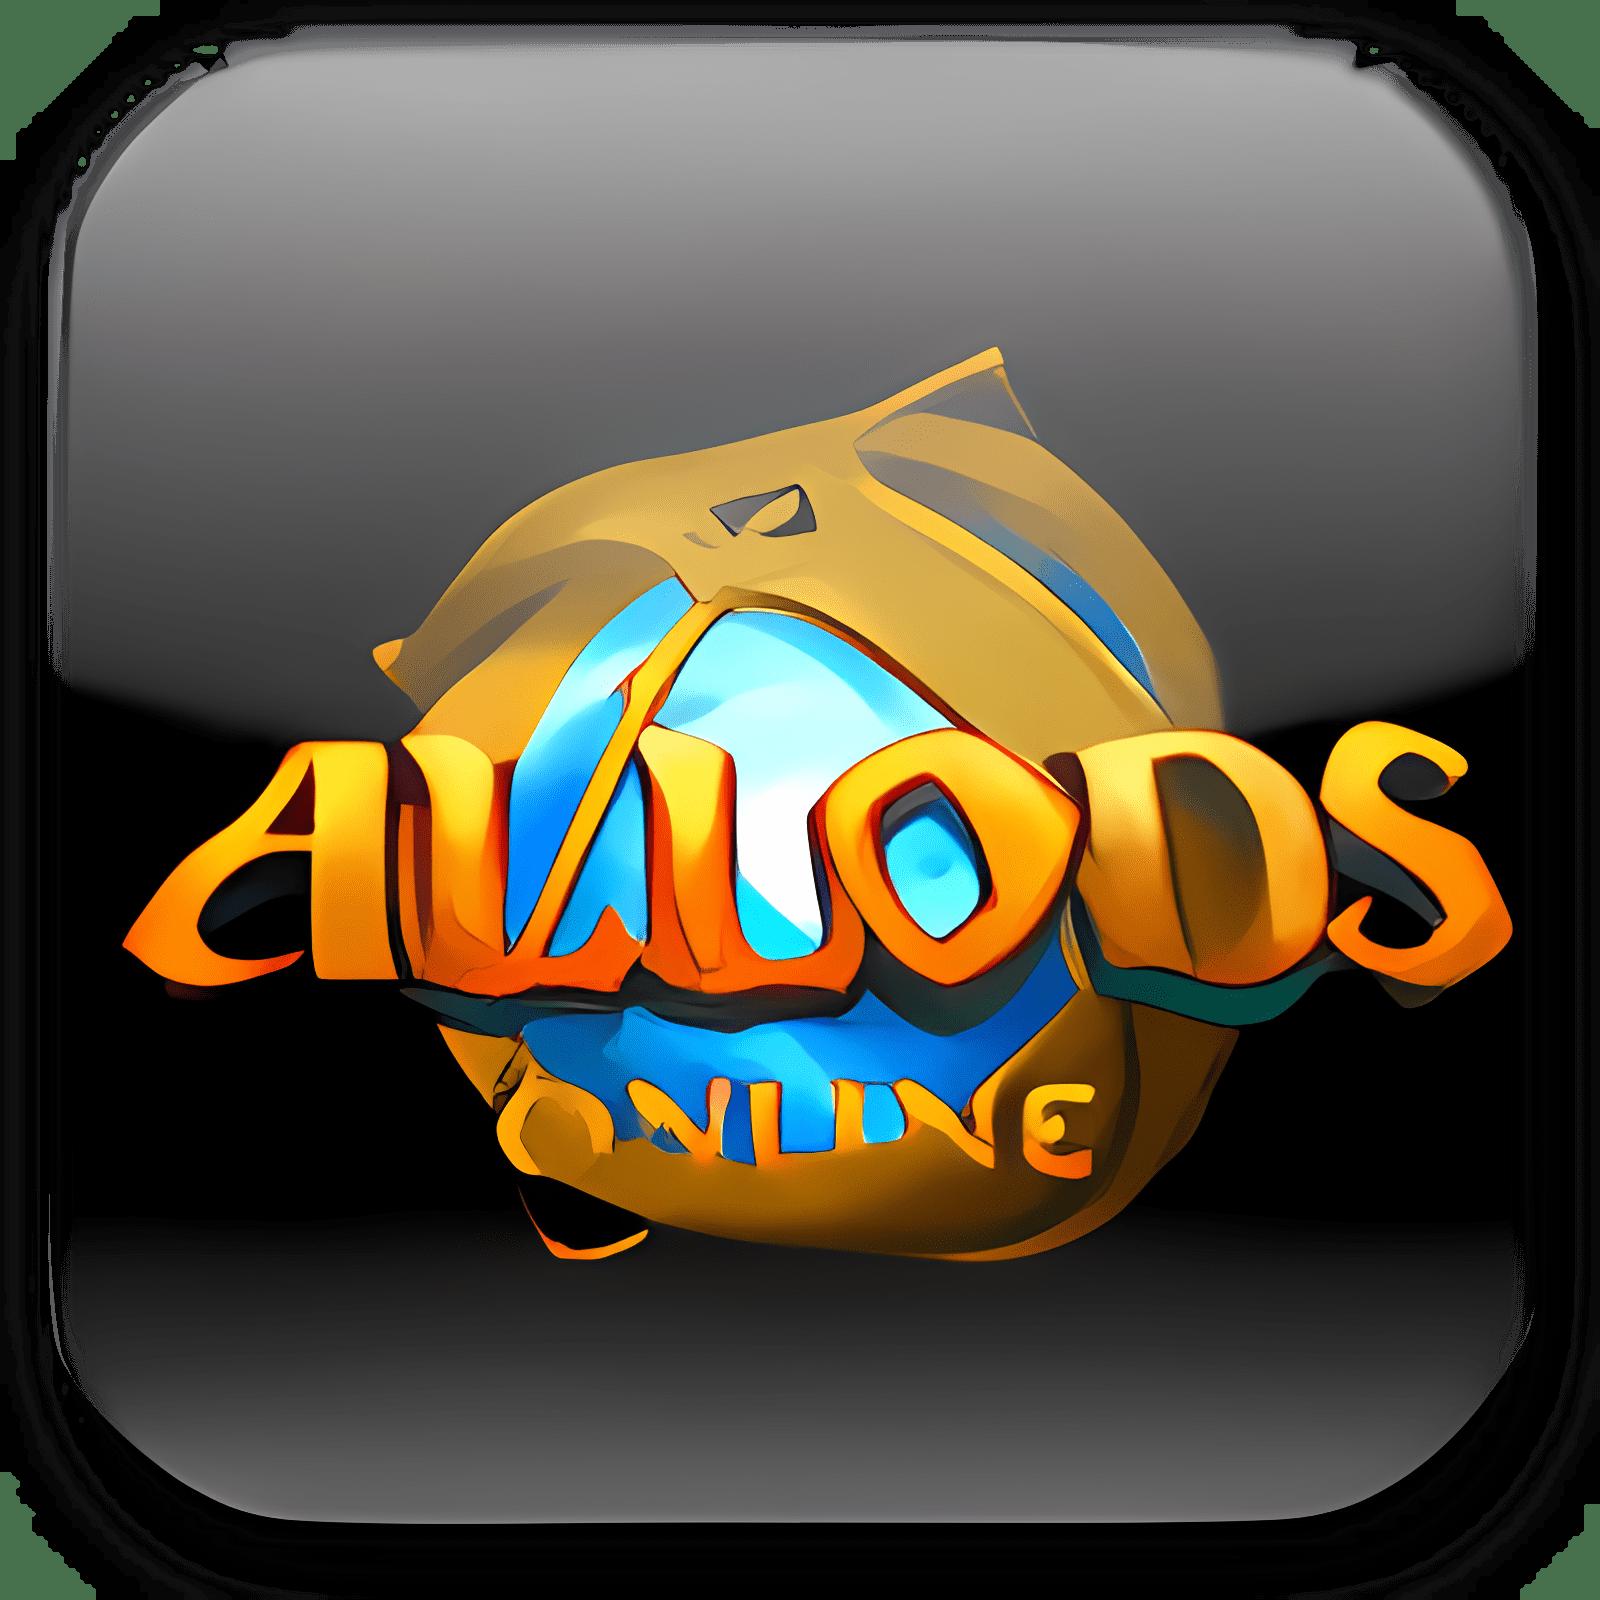 Allods